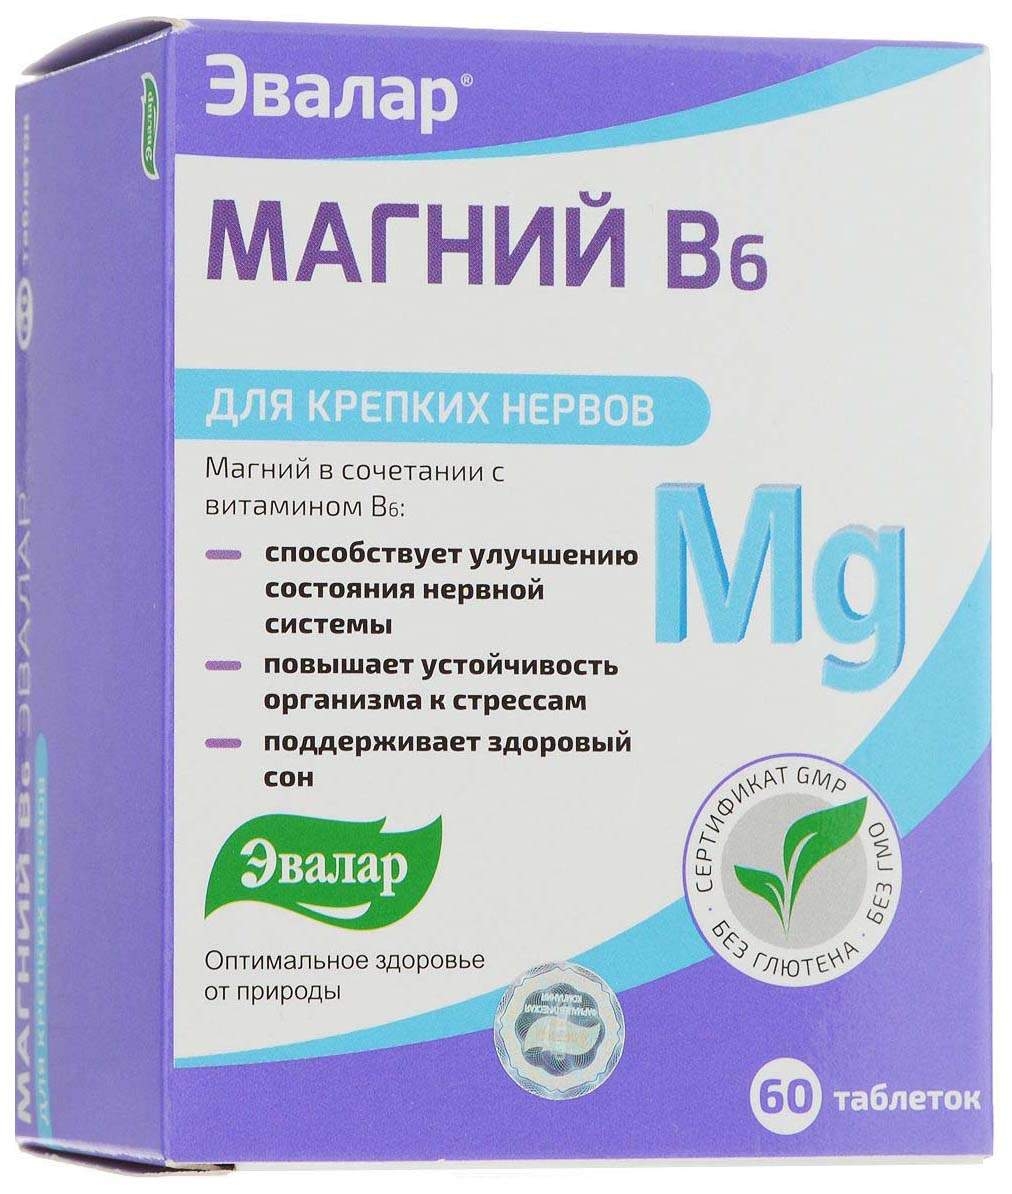 Витаминный комплекс Эвалар Магний B6 60 табл. - купить в Москве, цены на sbermegamarket.ru | витамины b EV0028